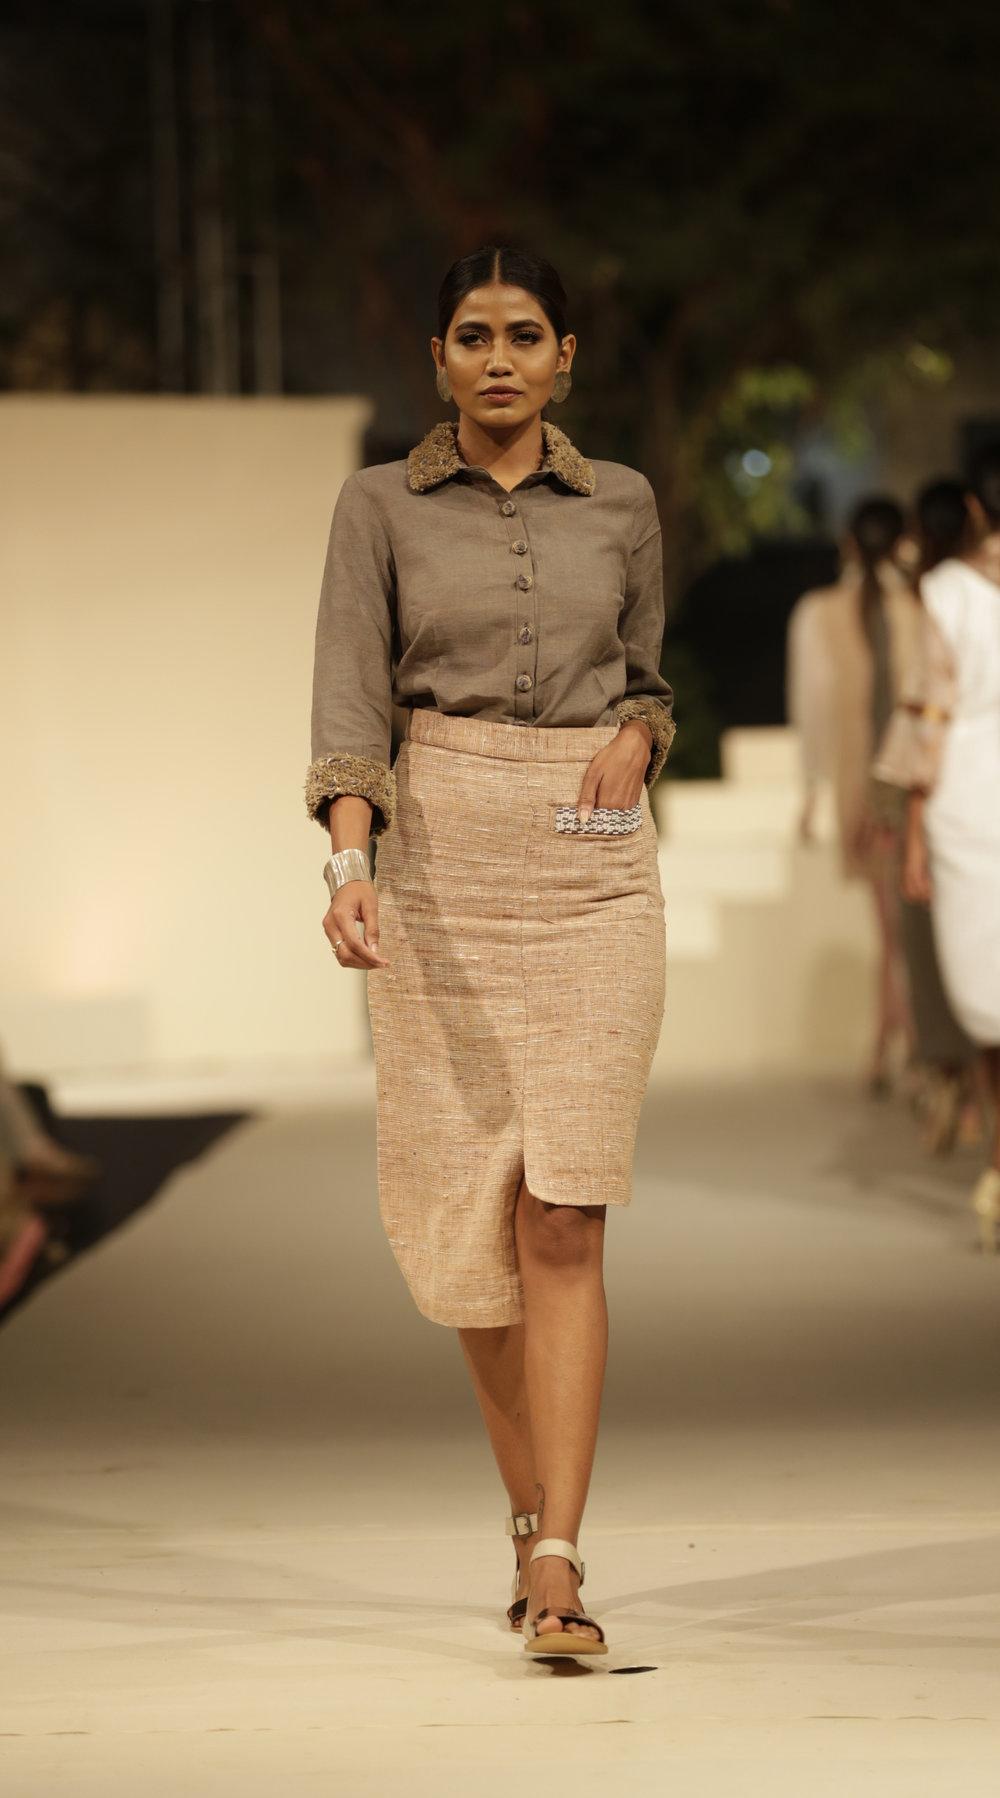 RH0601 Shirt   RH0602 Skirt